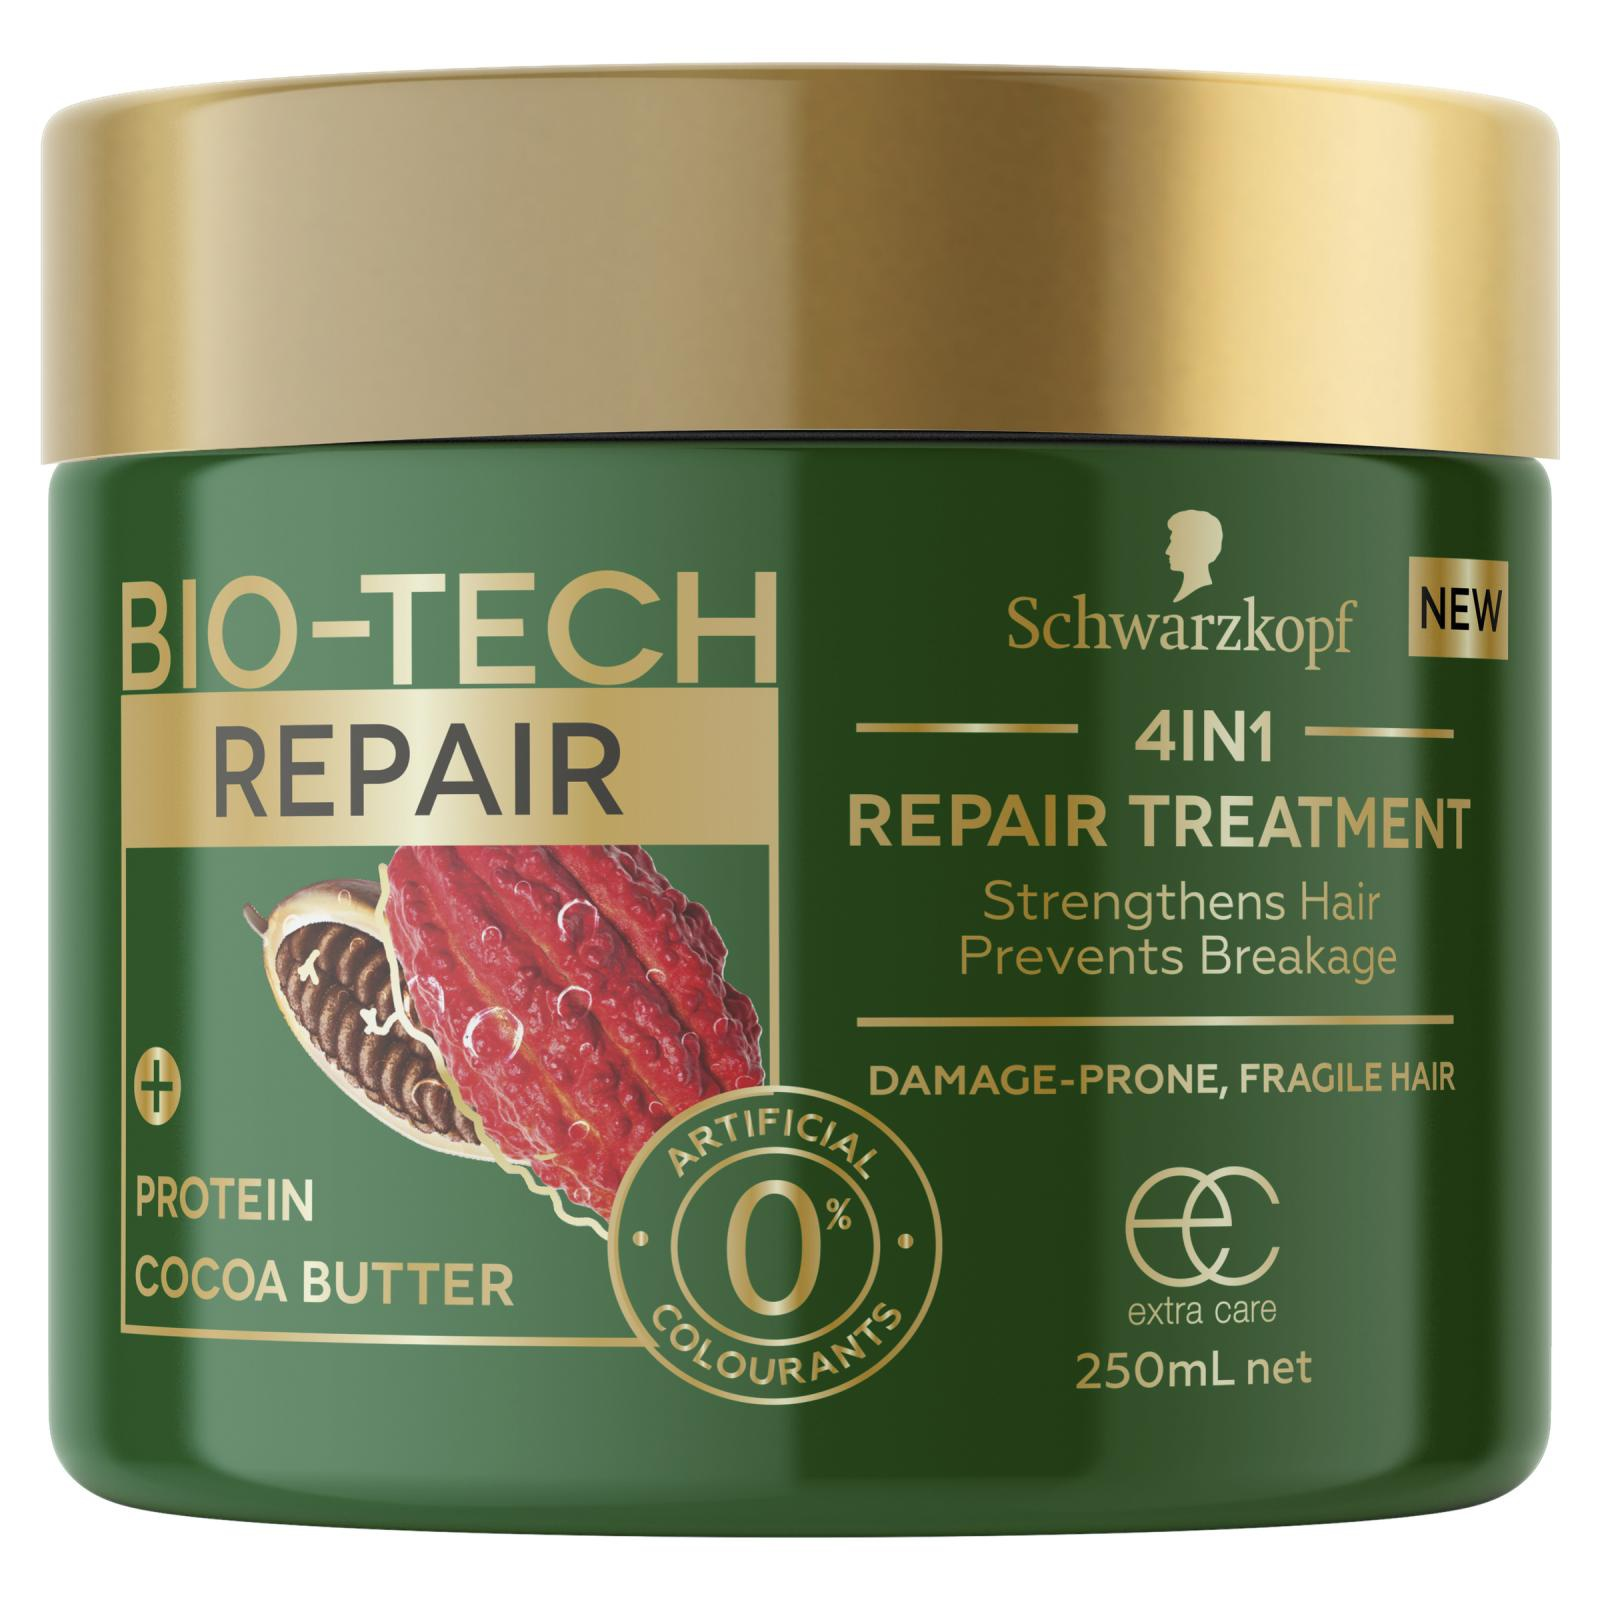 Schwarzkopf 4In1 Repair Treatment